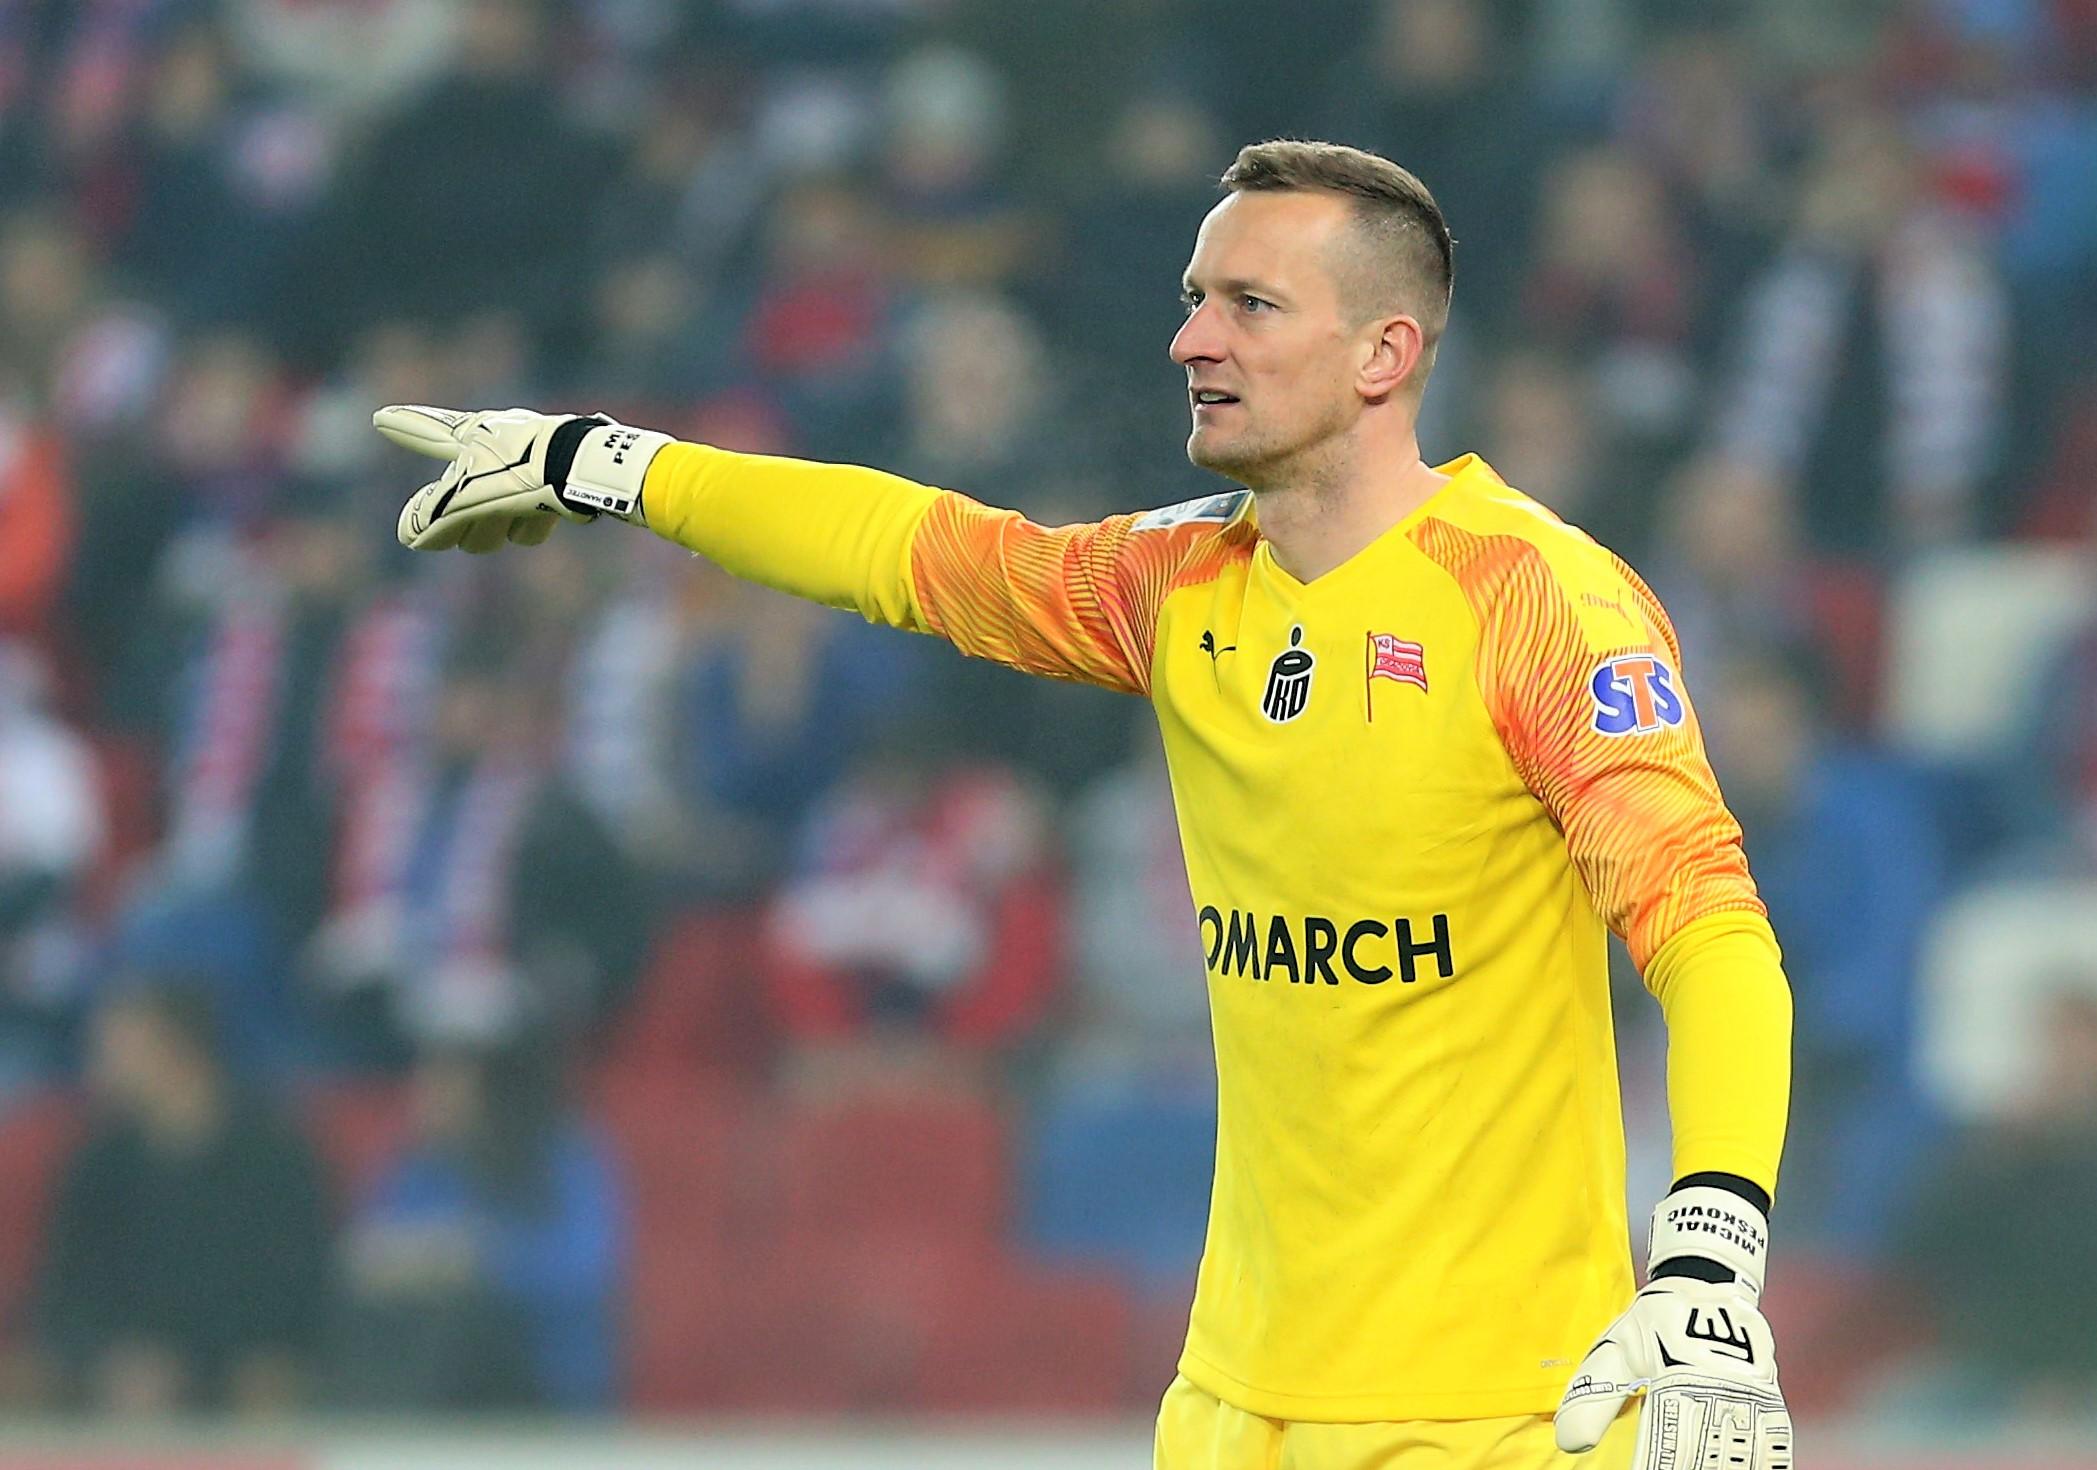 Bohaterowie meczu Cracovia - Lechia